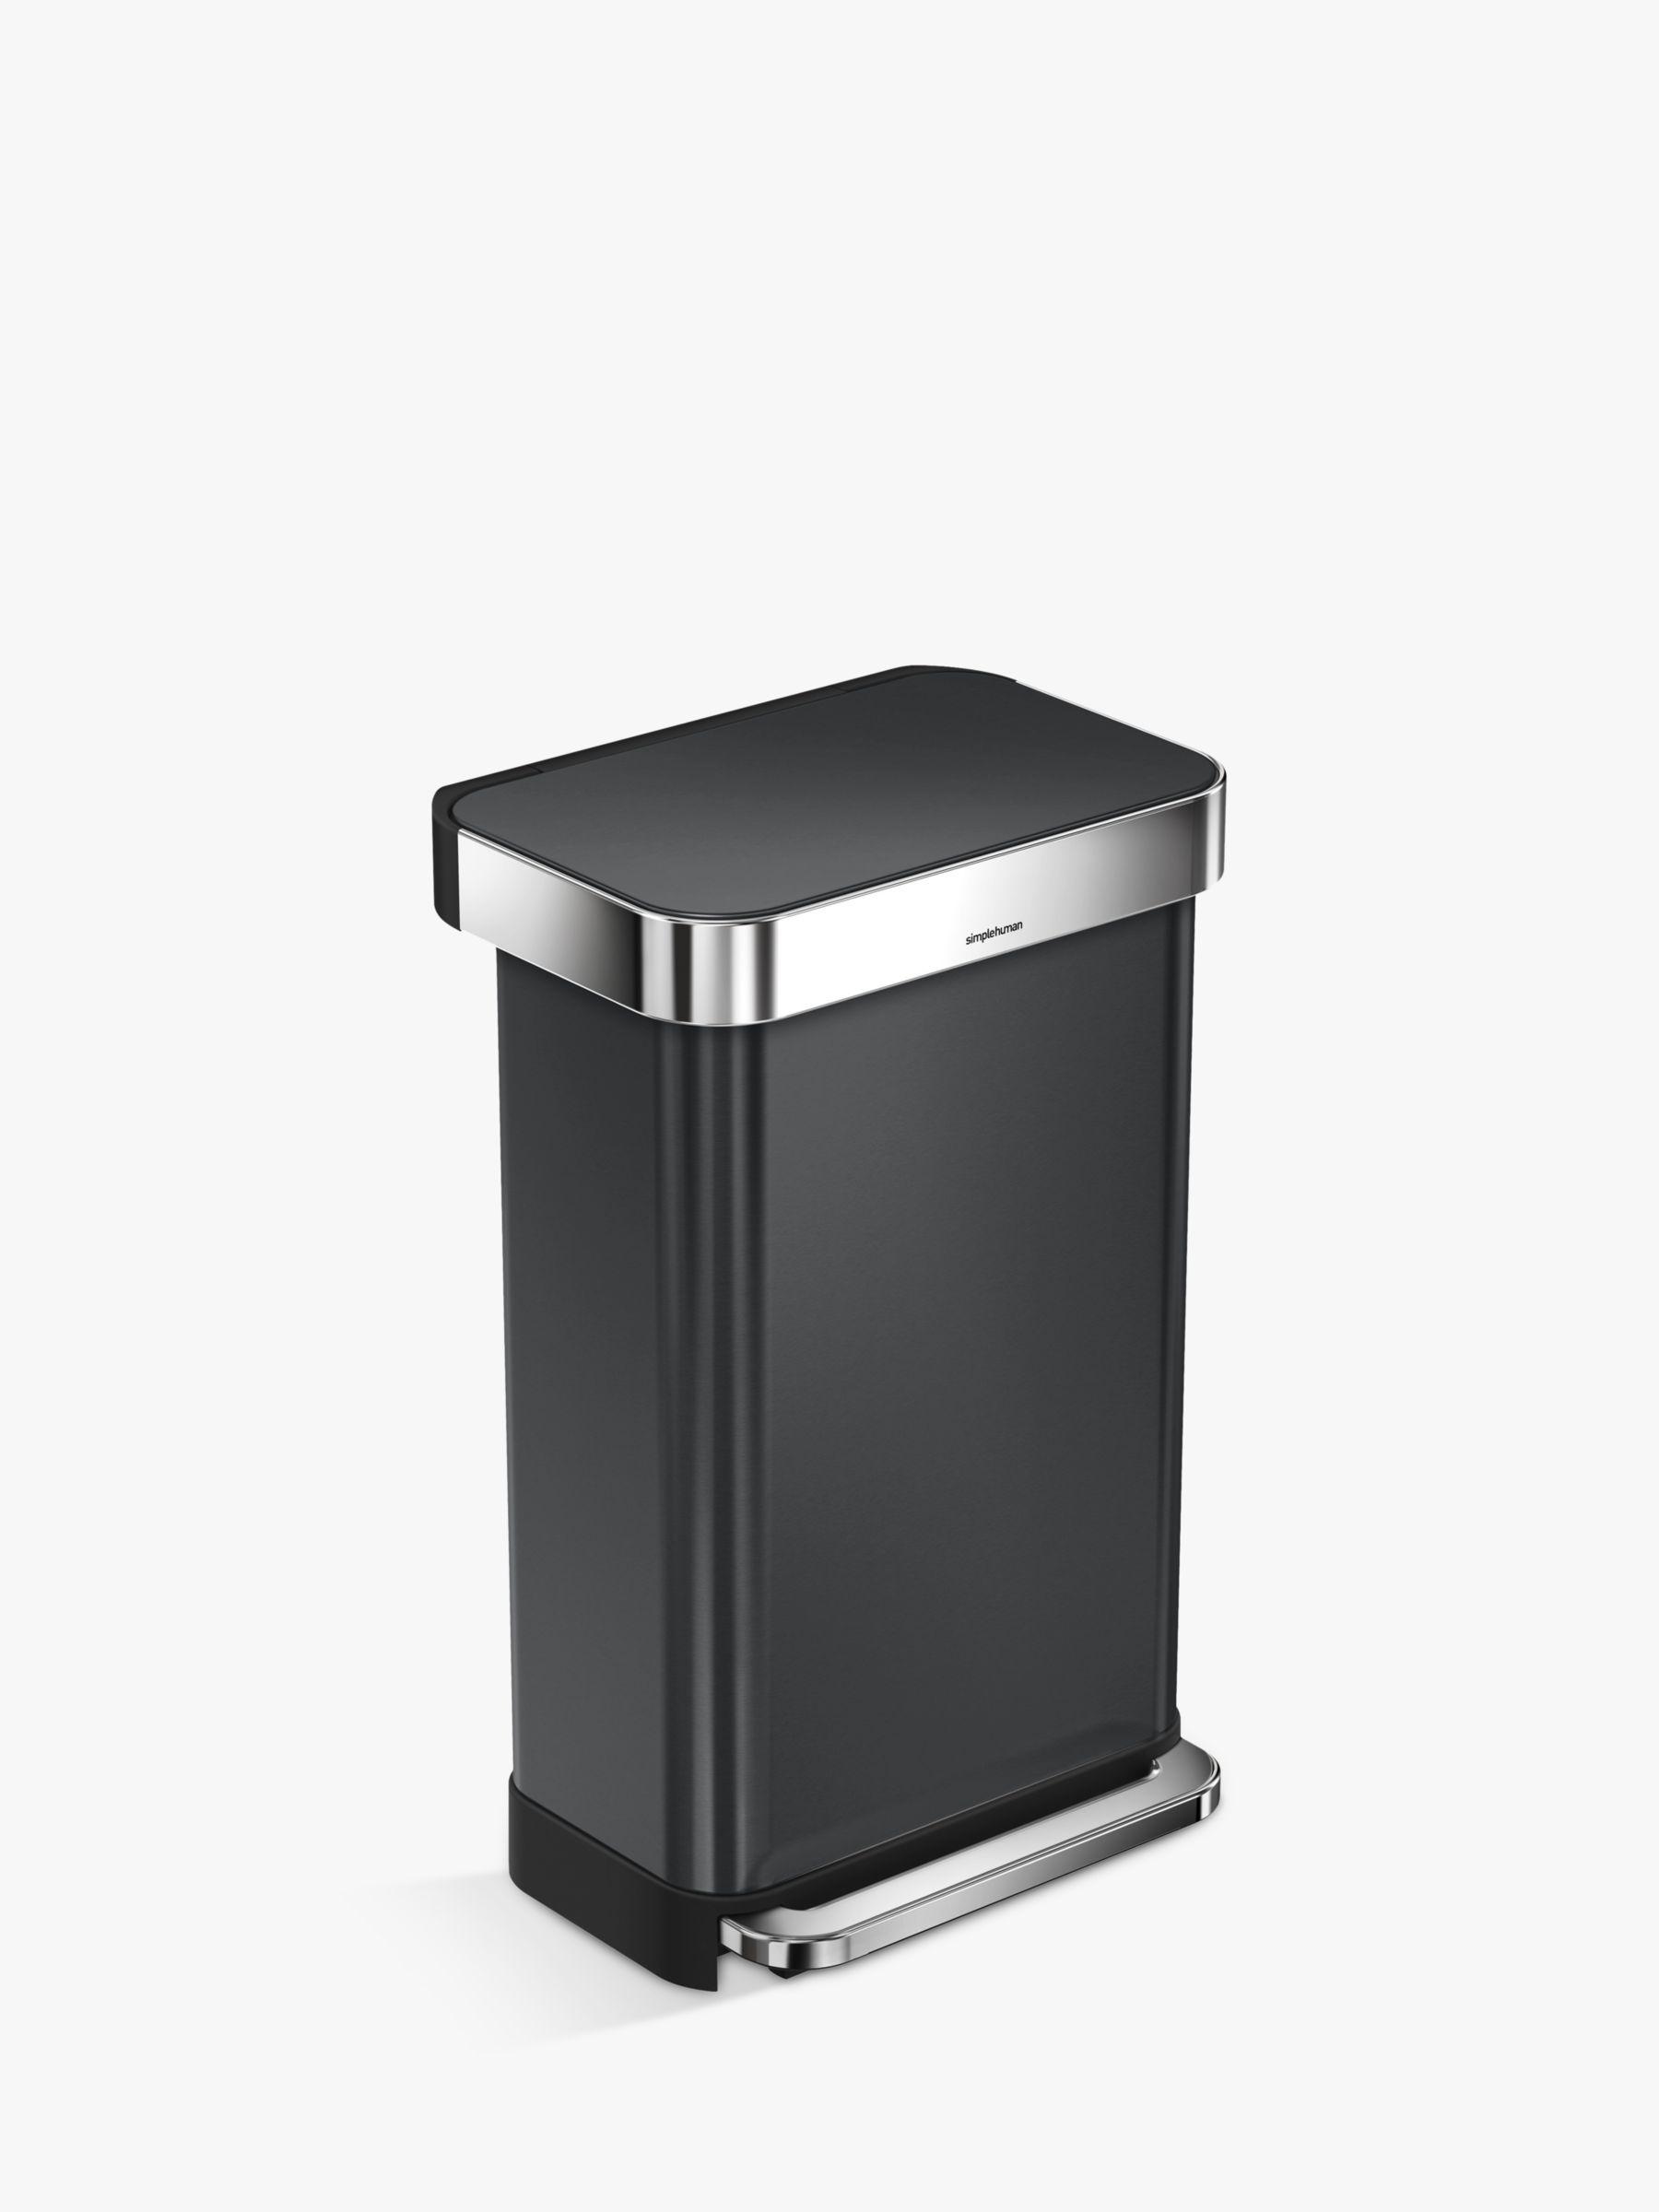 Simplehuman simplehuman Stainless Steel Pedal Bin, 45L, Black